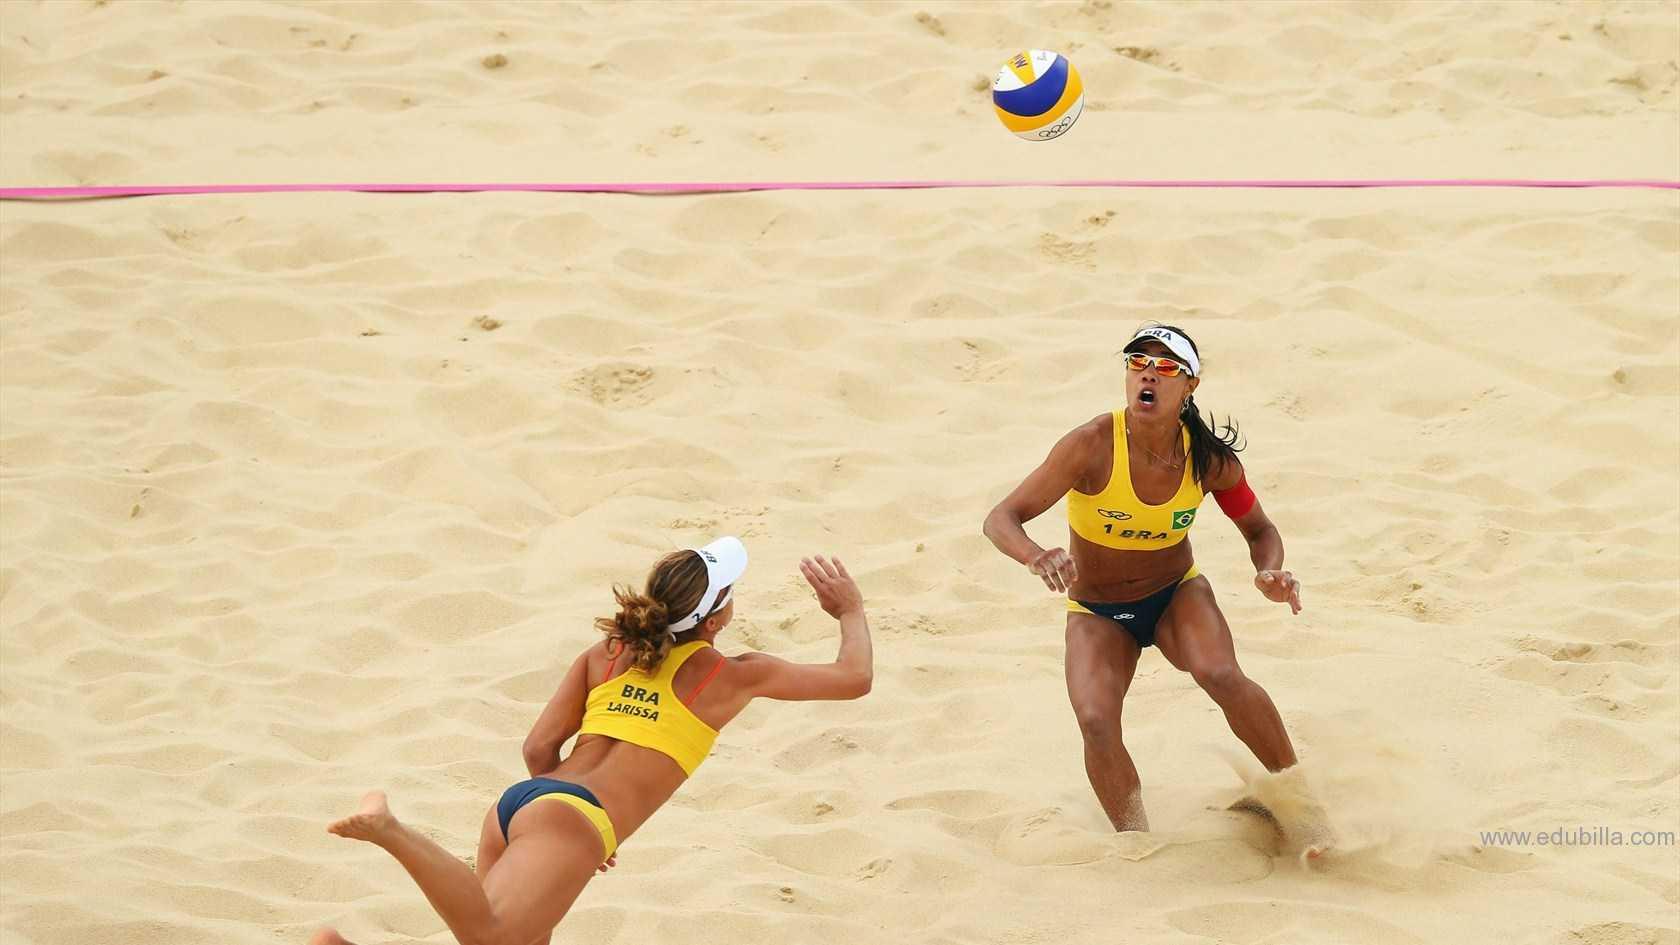 Beach Volleyball Gamesbeach Volleyball Rulesbeach Volleyball